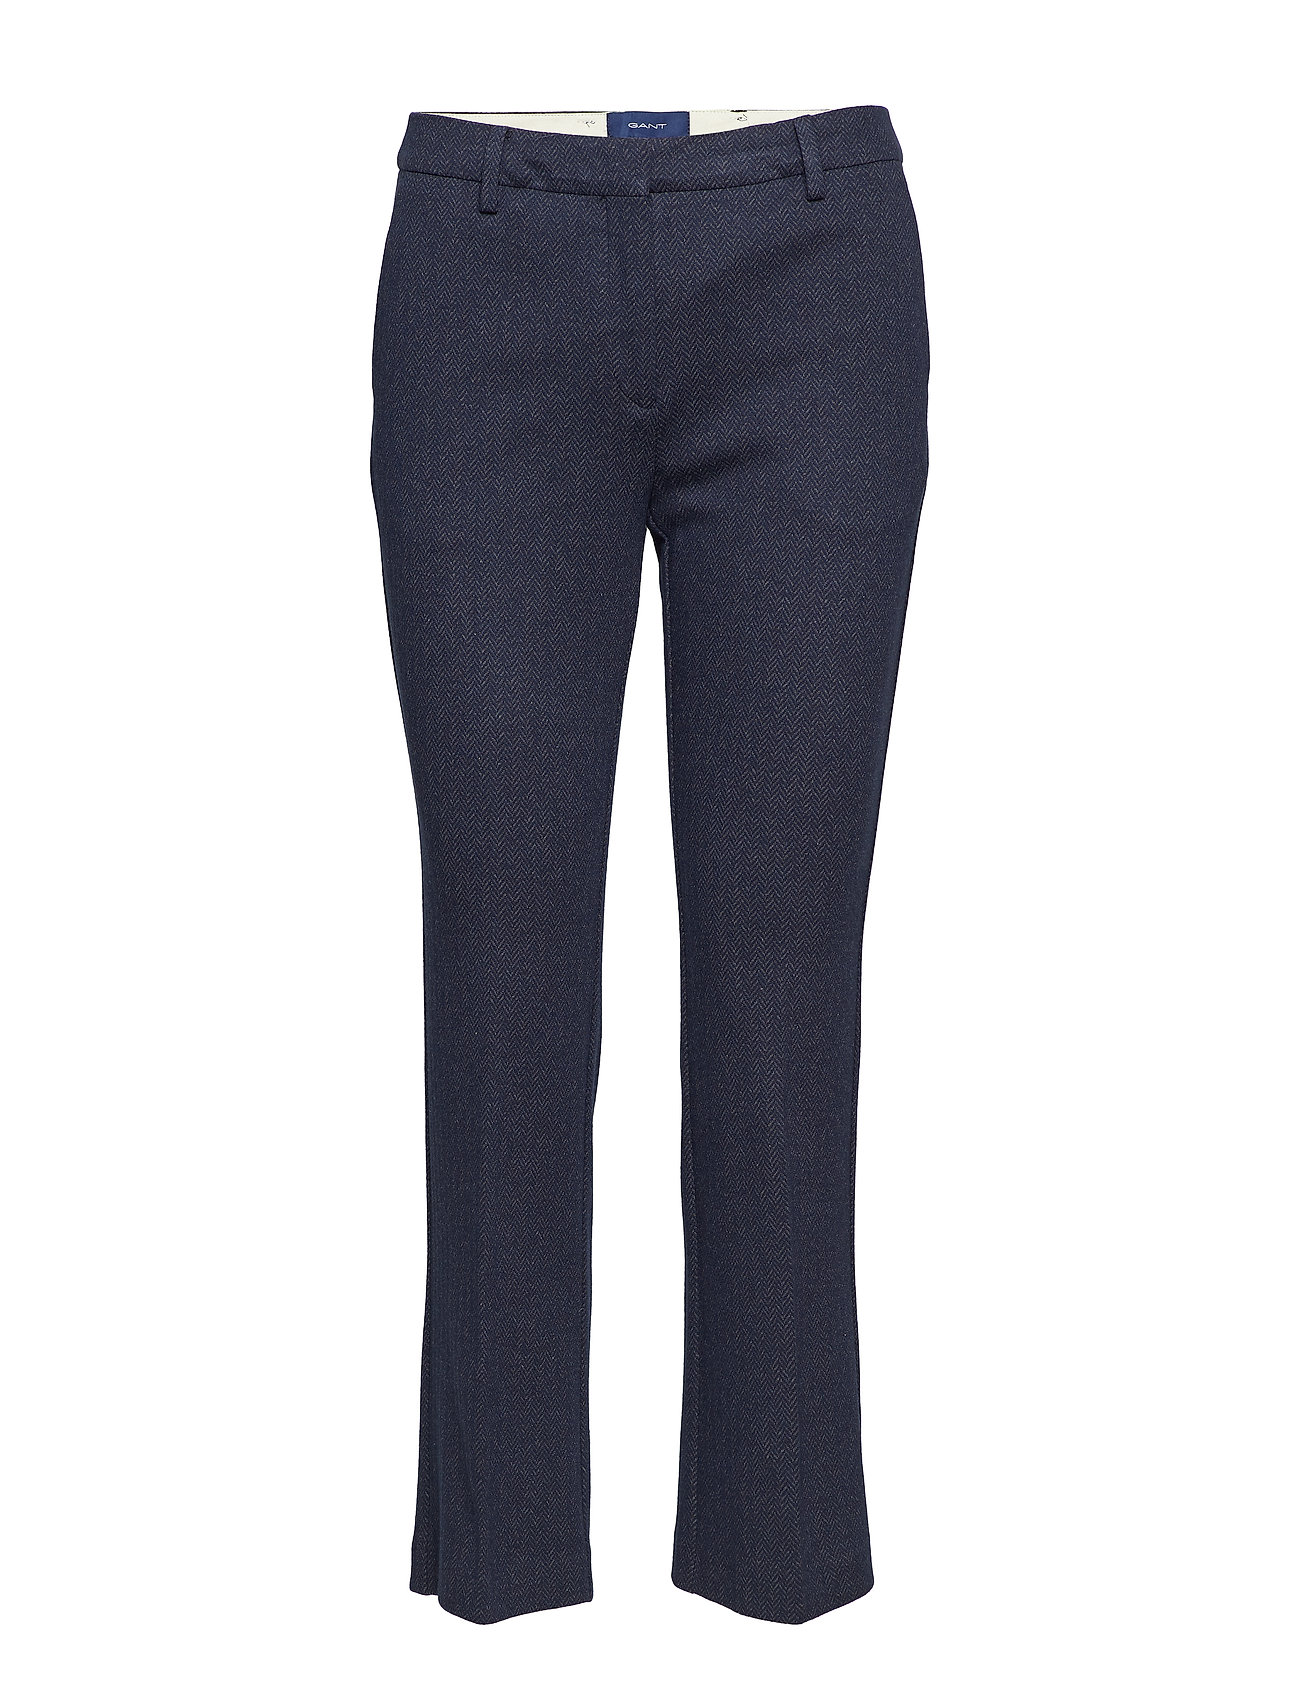 6b389090 O1.herringbone Jersey Pants (Marine) (£77.50) - GANT - | Boozt.com